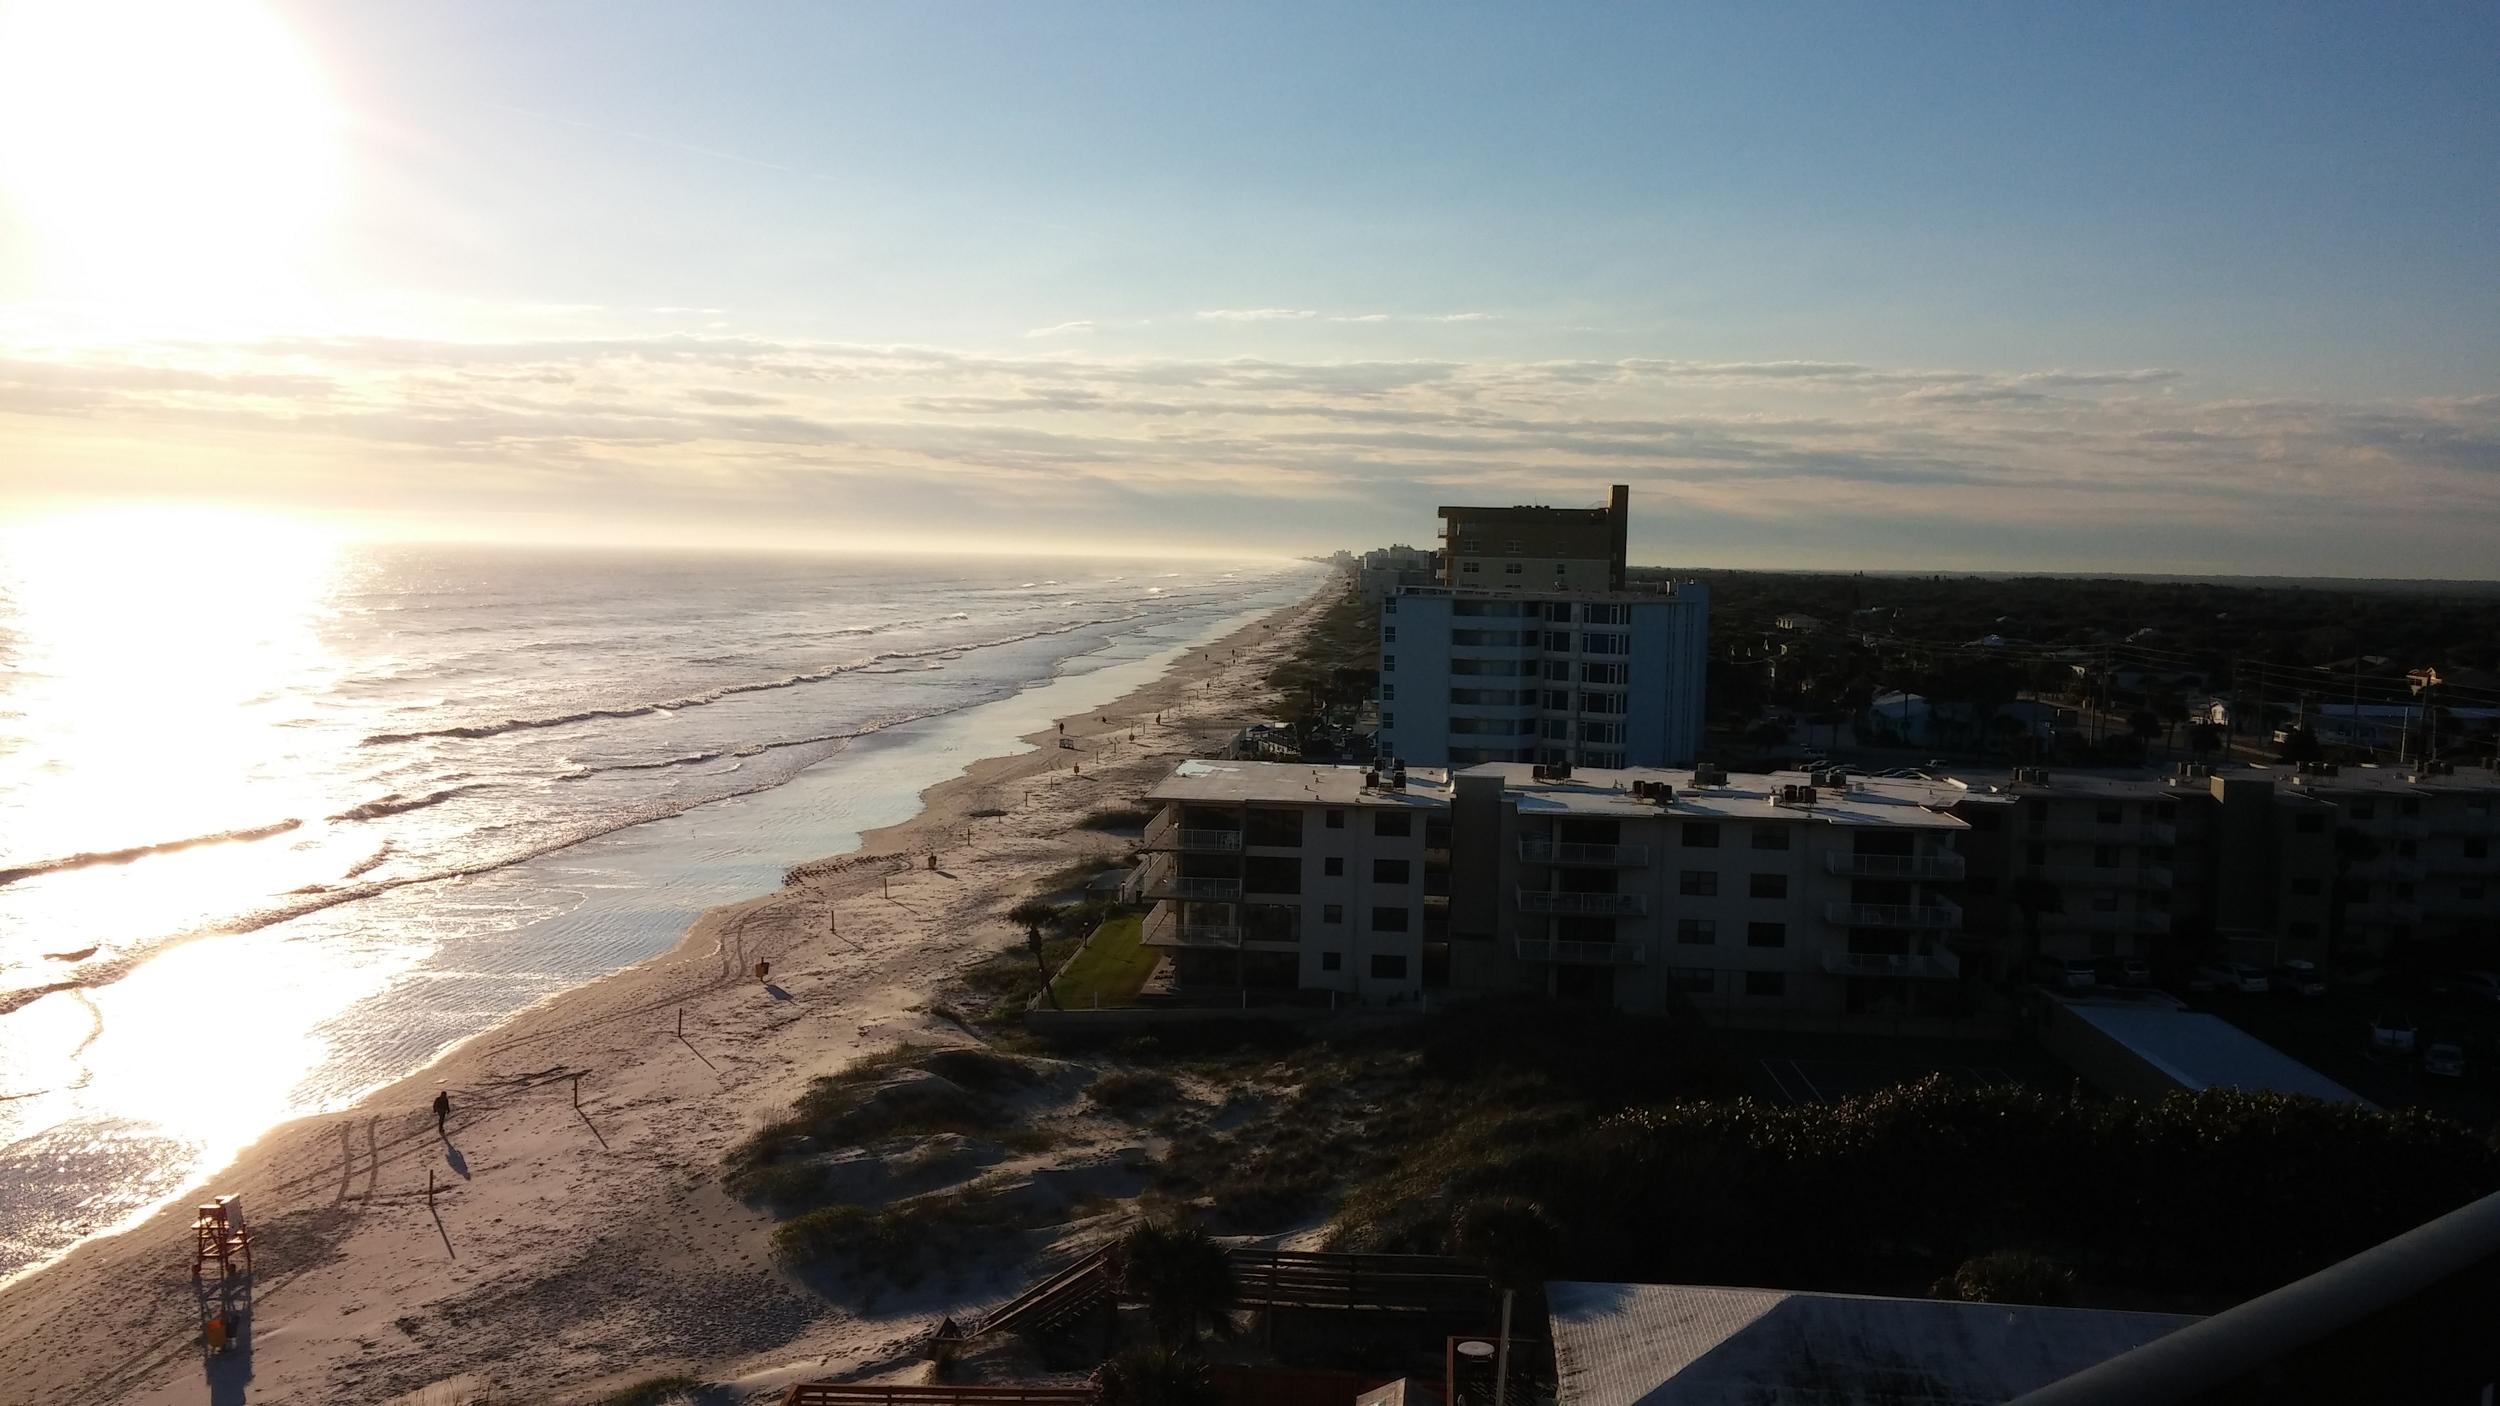 2016-01-11 Best Western New Smyrna Beach FL 6.jpg